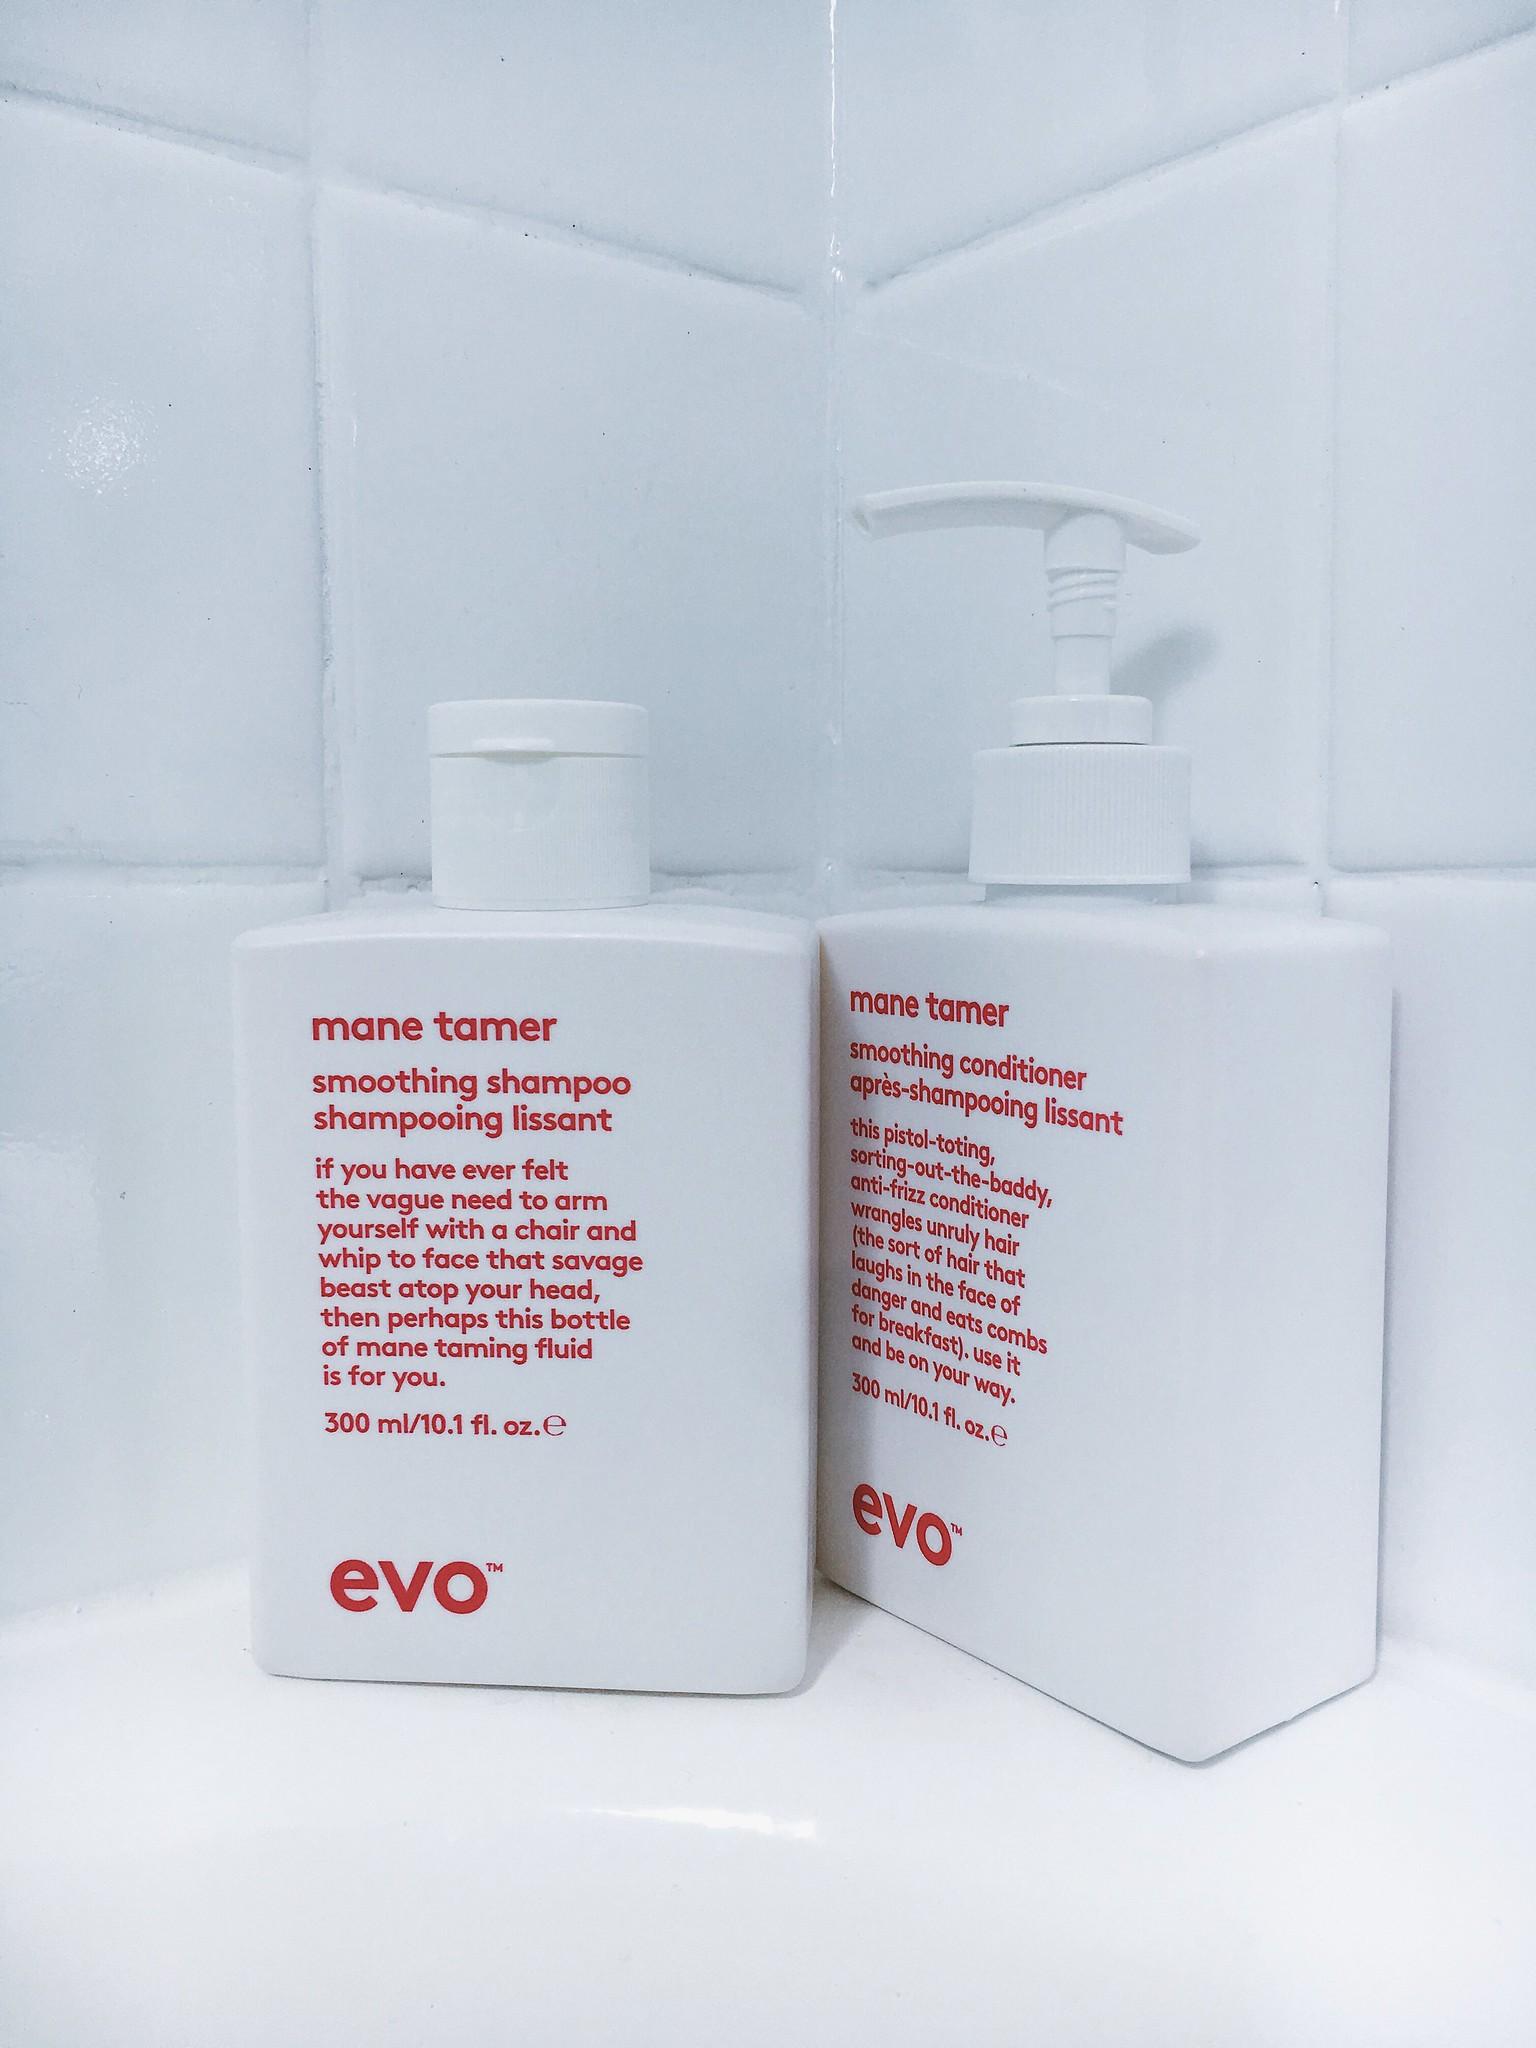 evo hair product